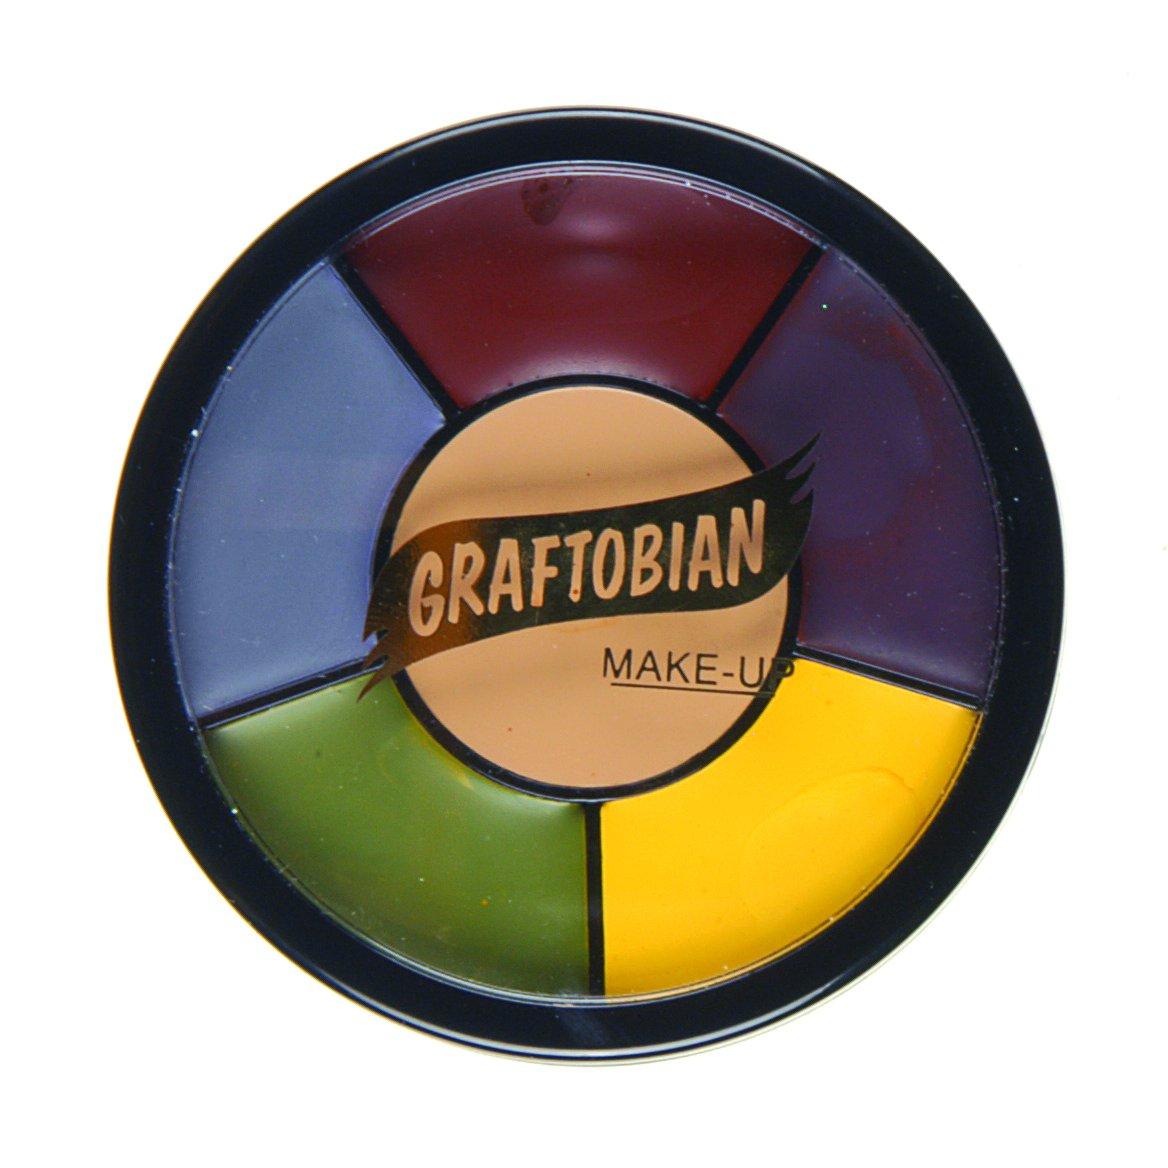 Graftobian Professional Makeup Severe Trauma Wheel, 1 Ounce